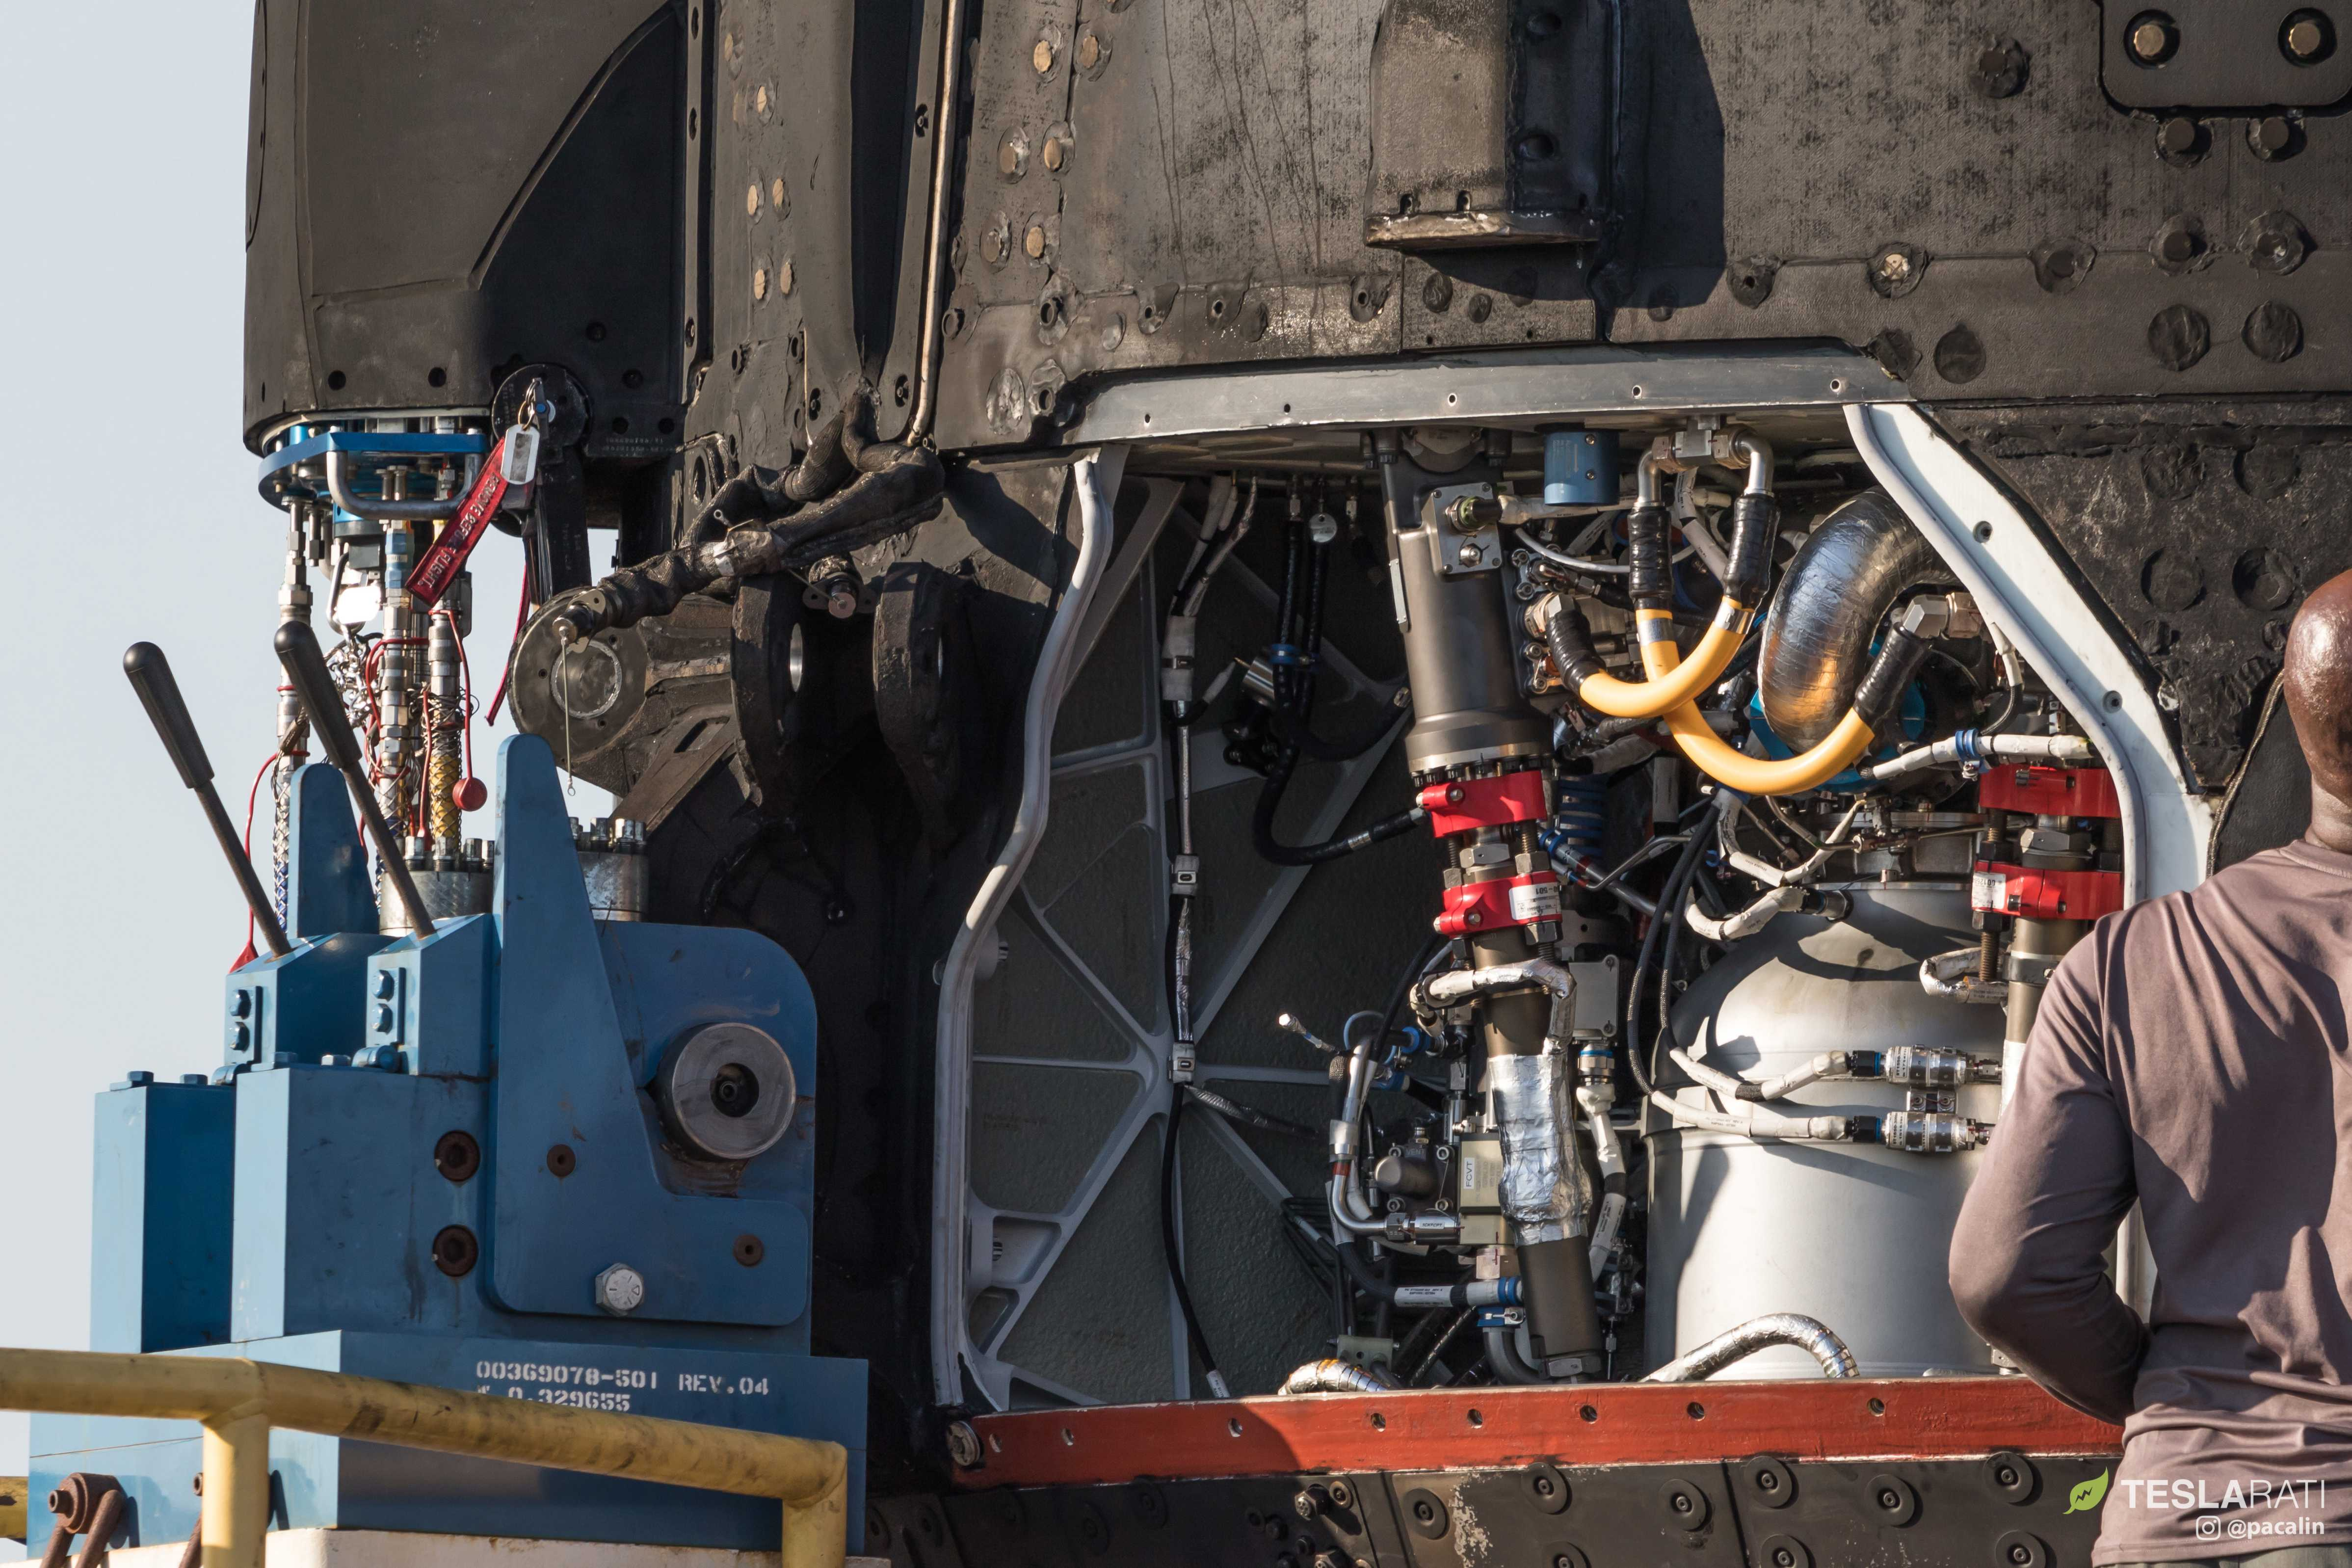 F9 B1048 engine bay and octaweb (Pauline Acalin) (23)(c)